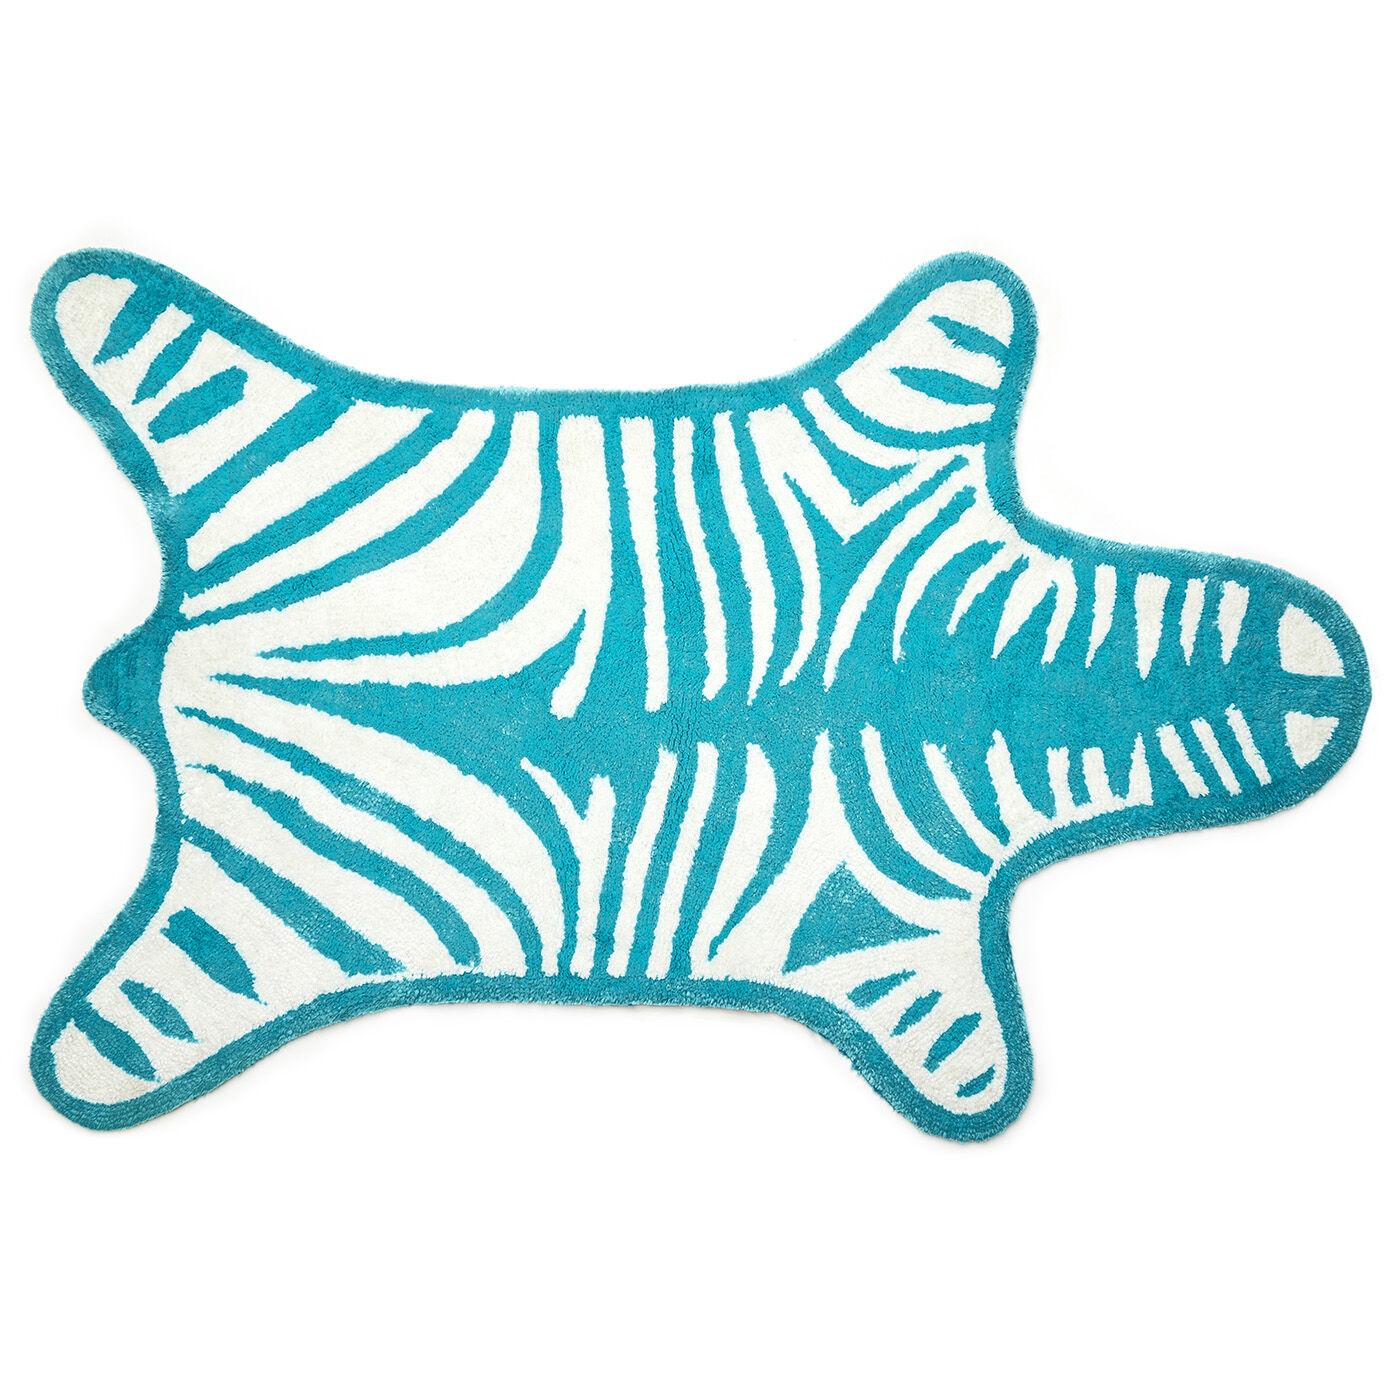 Bath Mats   Reversible Zebra Bathmat Bath Mats   Reversible Zebra Bathmat